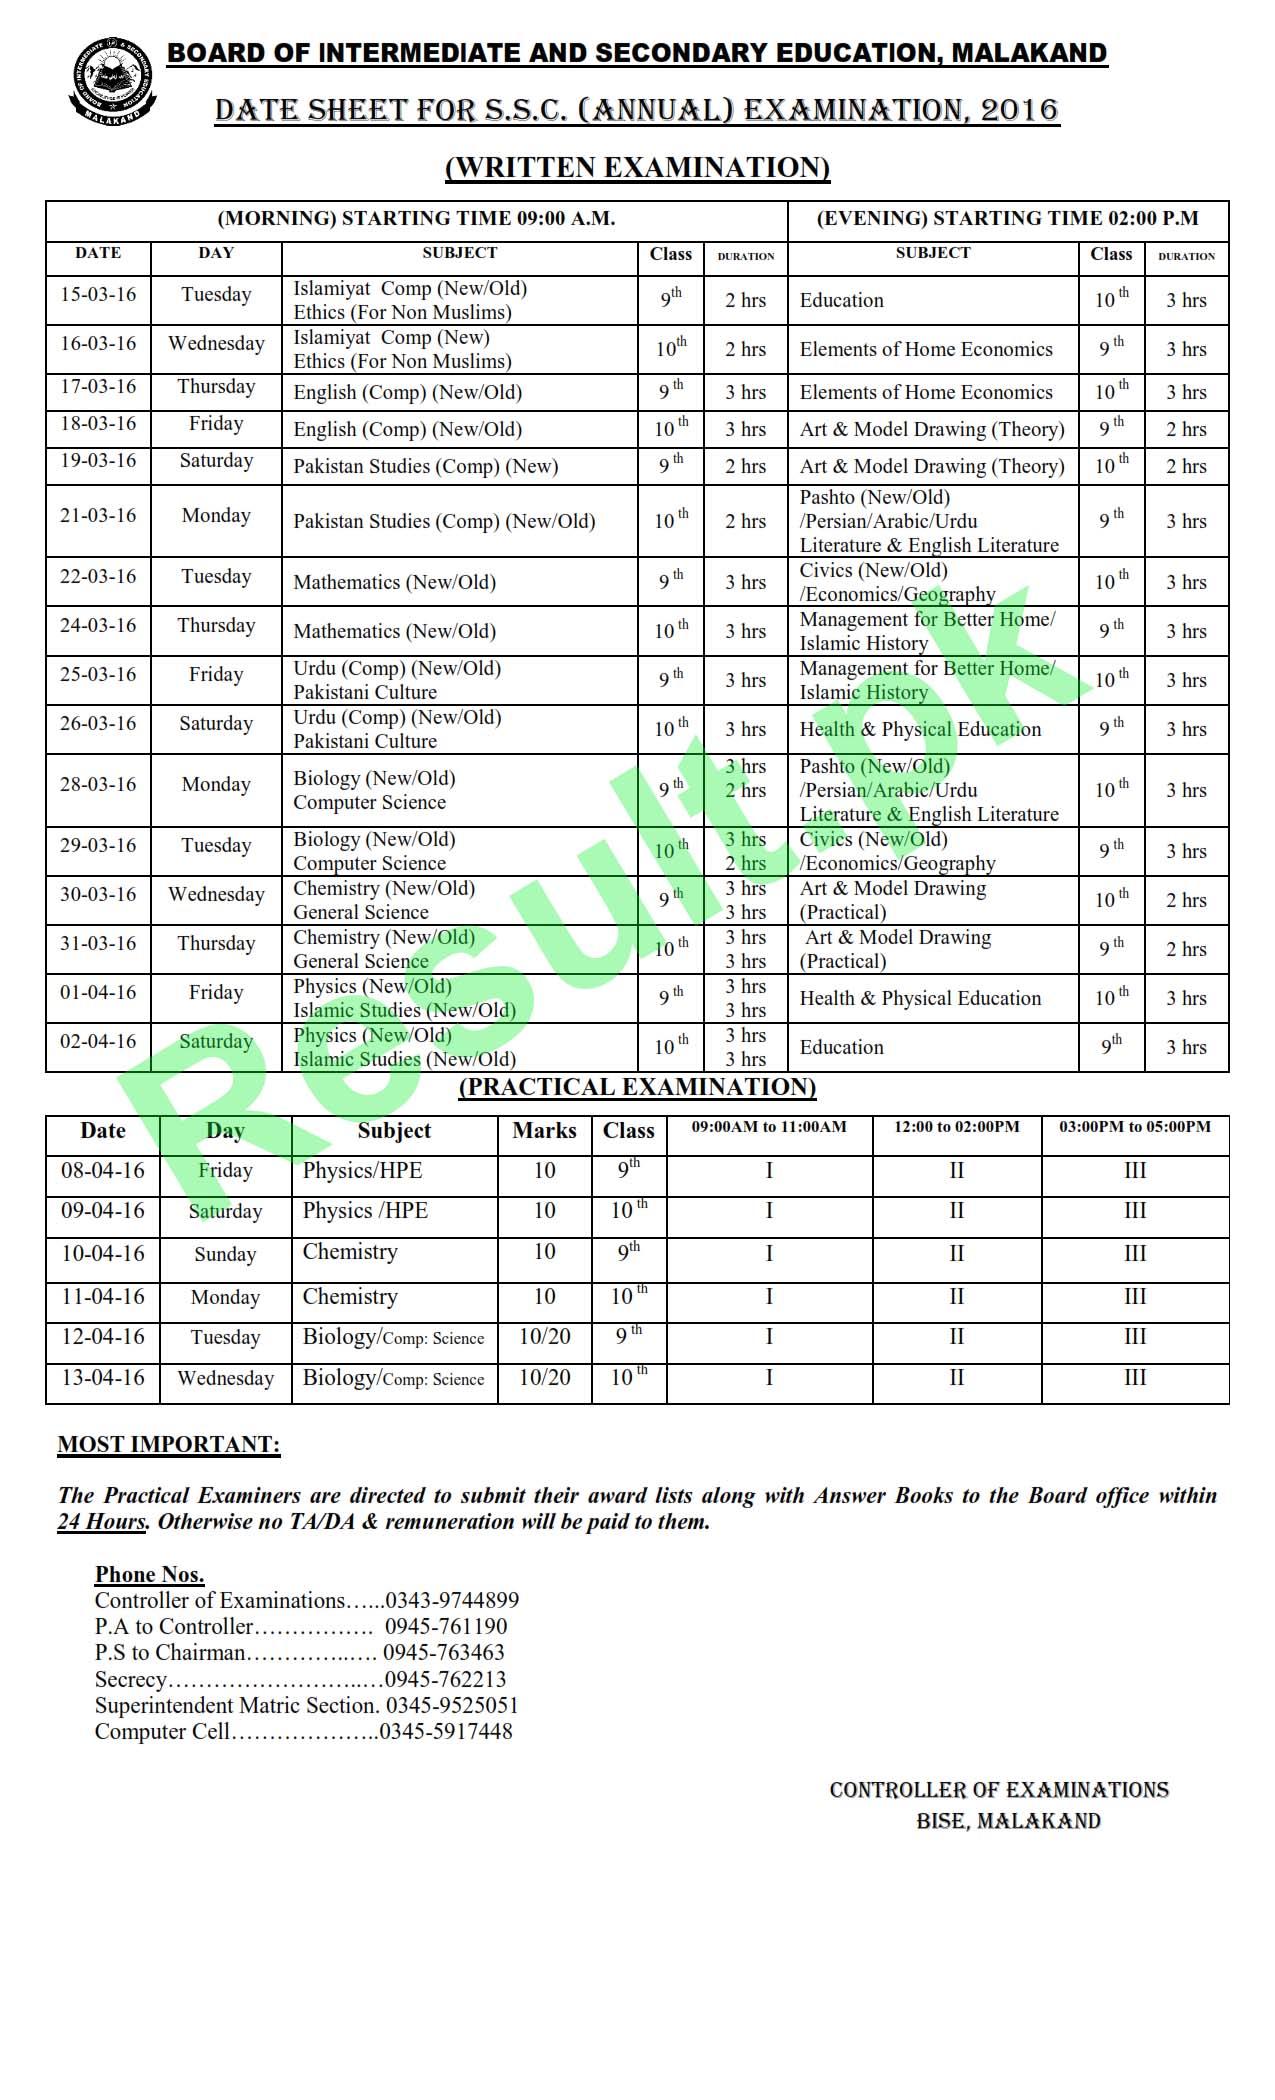 BISE Mardan Board Date Sheet 2019 Matric Part 1 2, 9th & 10th, SSC